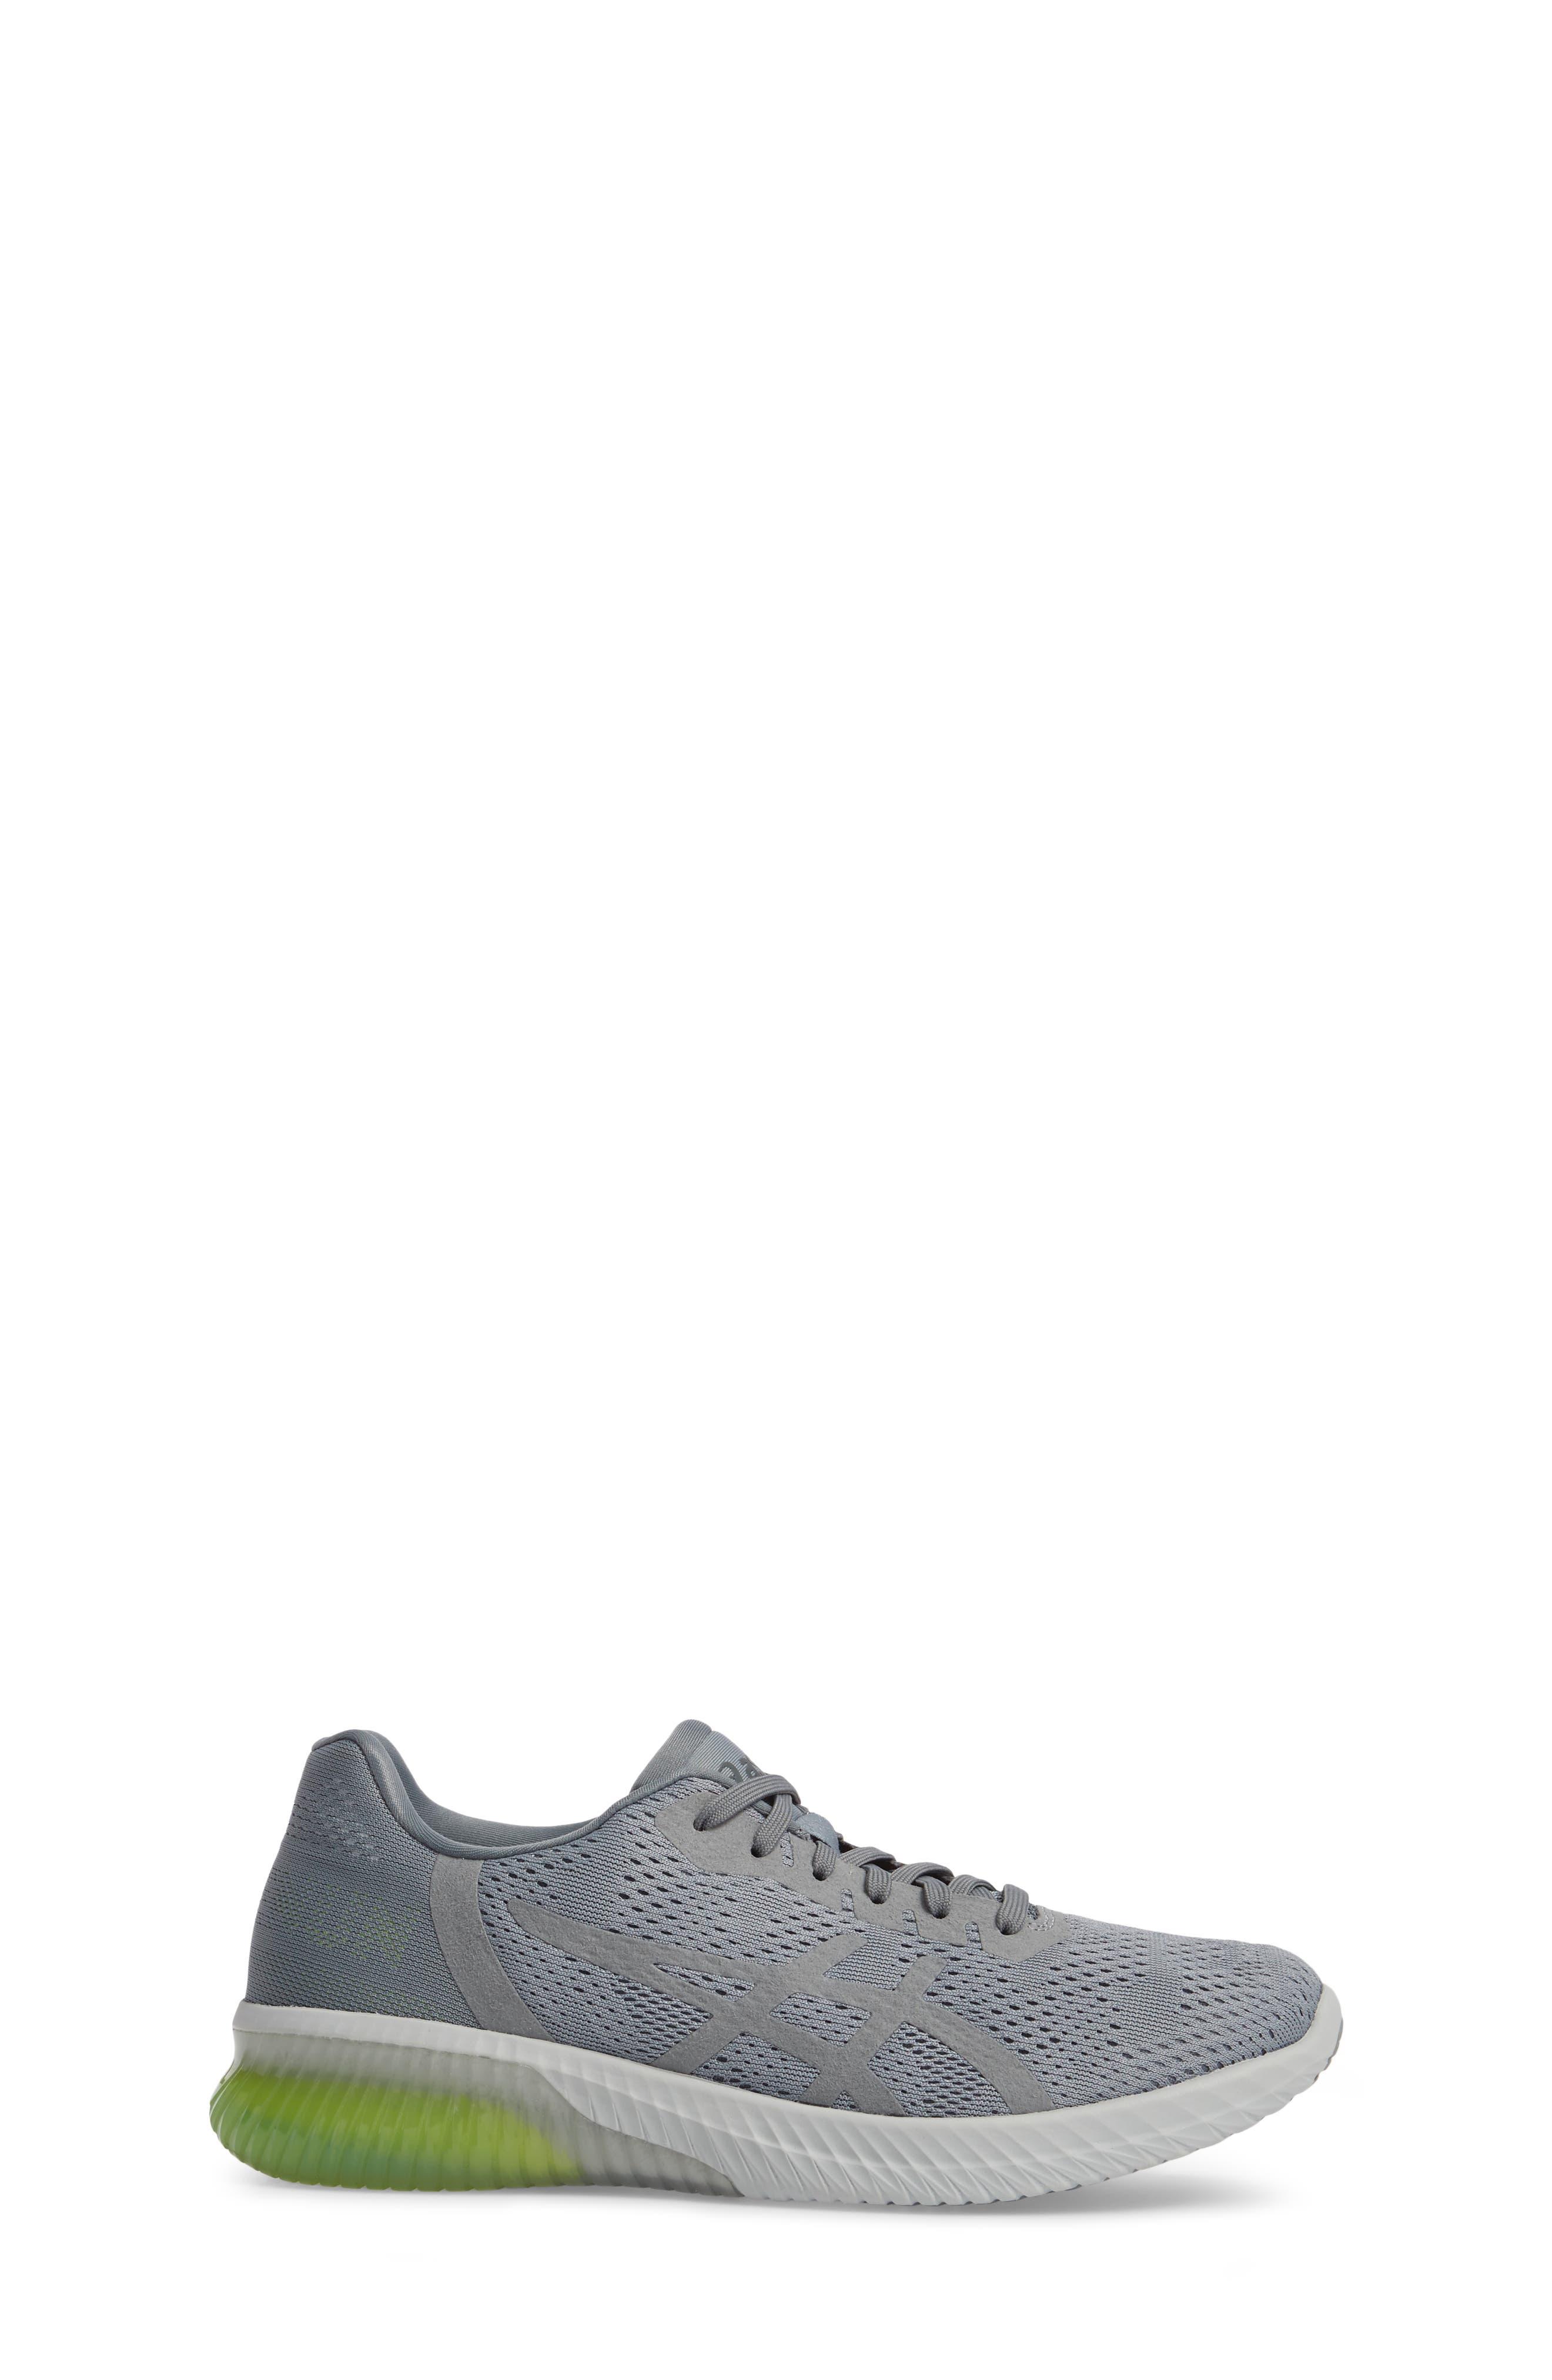 Gel-Kenun Running Shoe,                             Alternate thumbnail 3, color,                             023